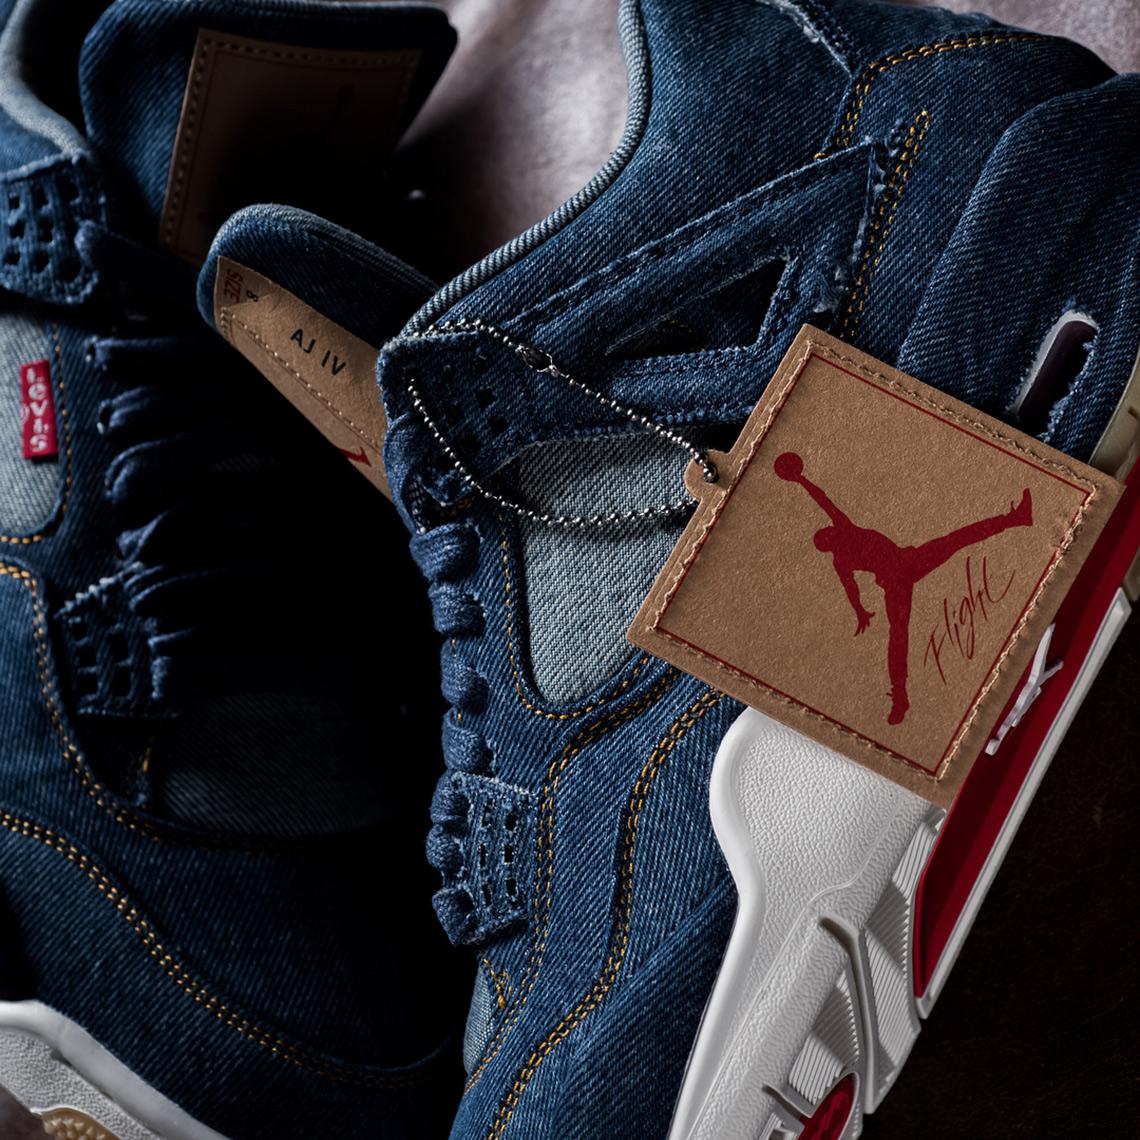 Air Jordan 8 Valentinsdag Champs Elysees jcZ3jeOaQ